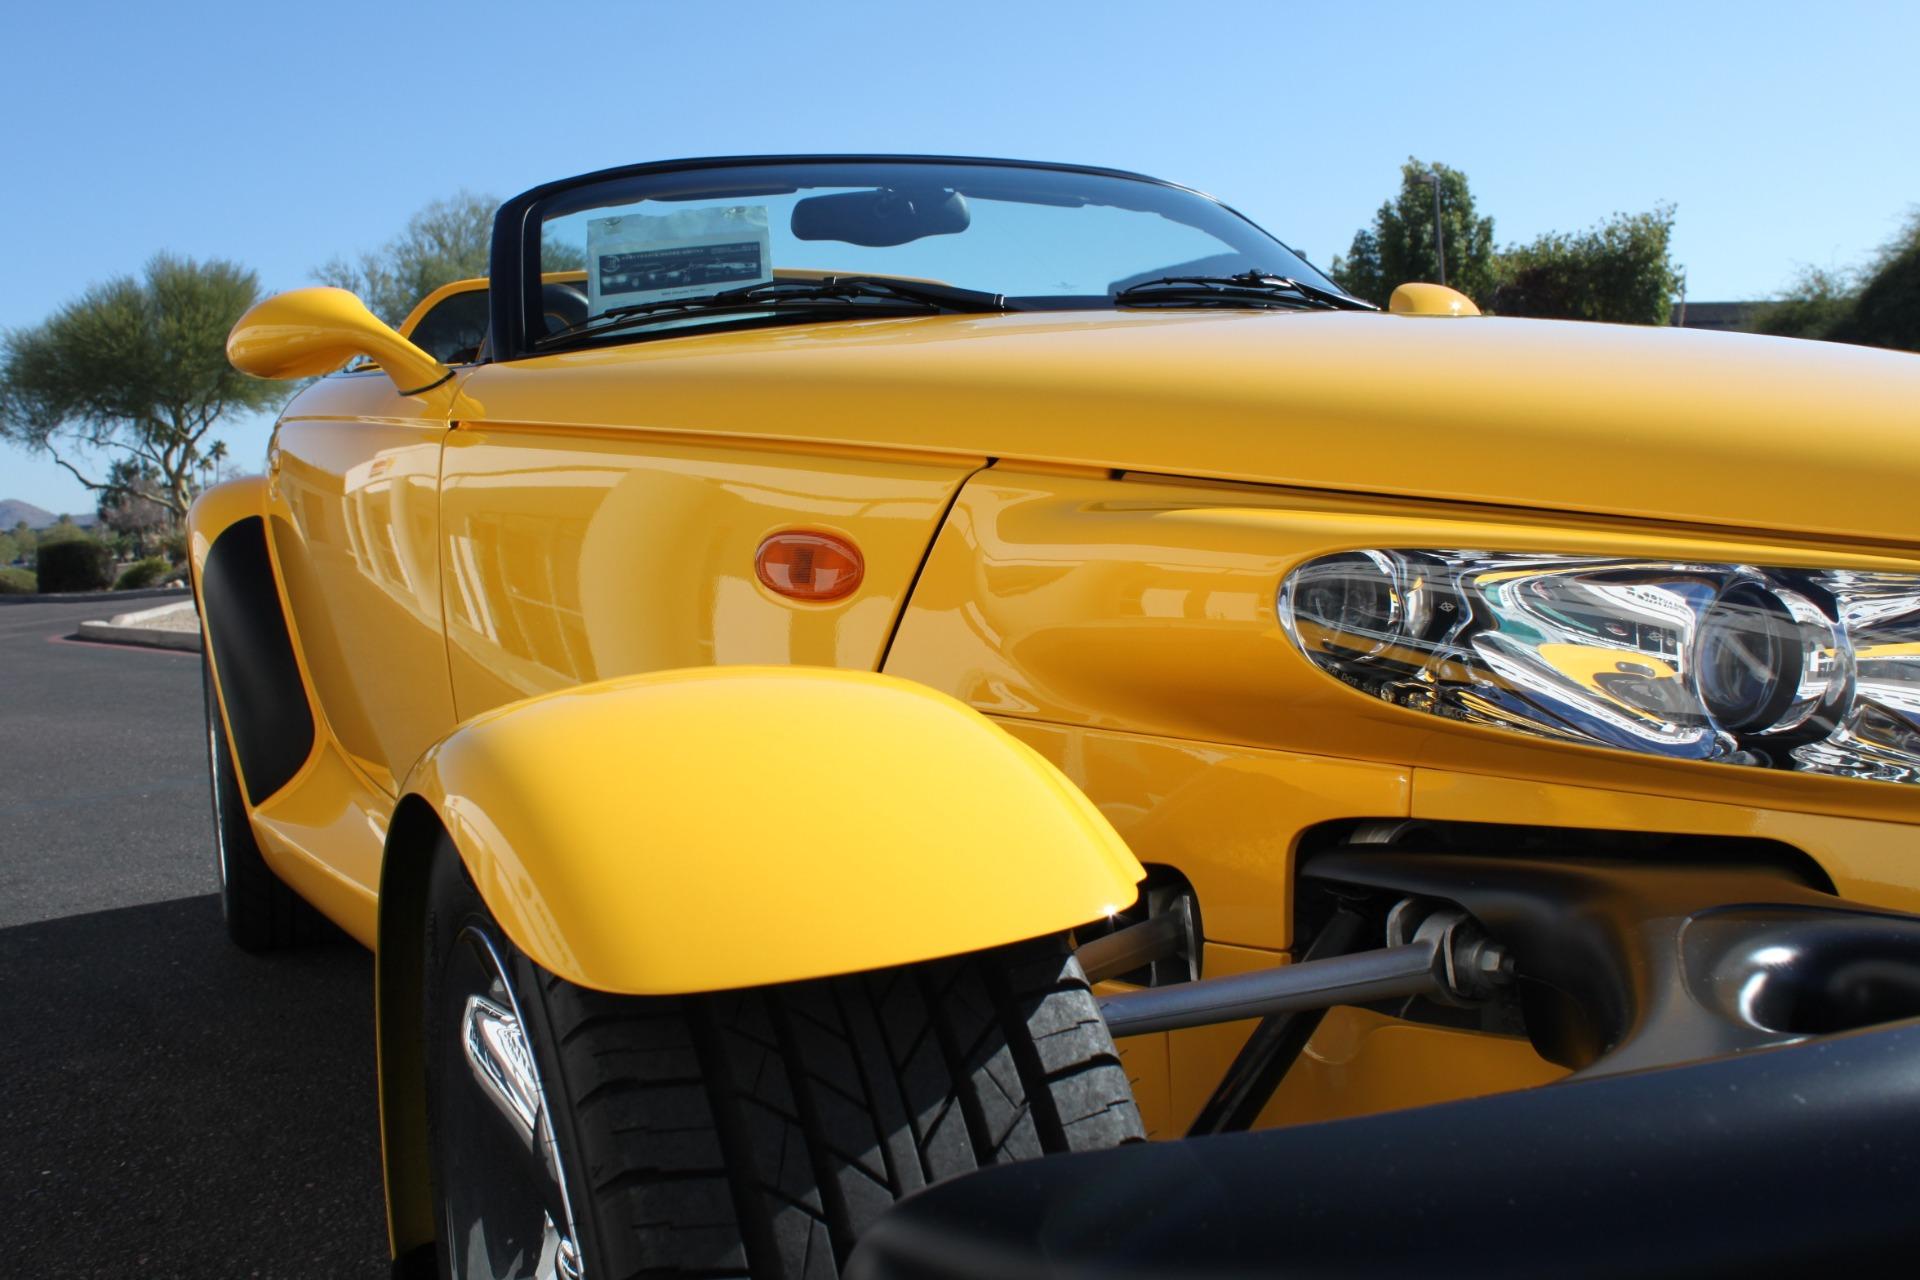 Used-2002-Chrysler-Prowler-Lexus